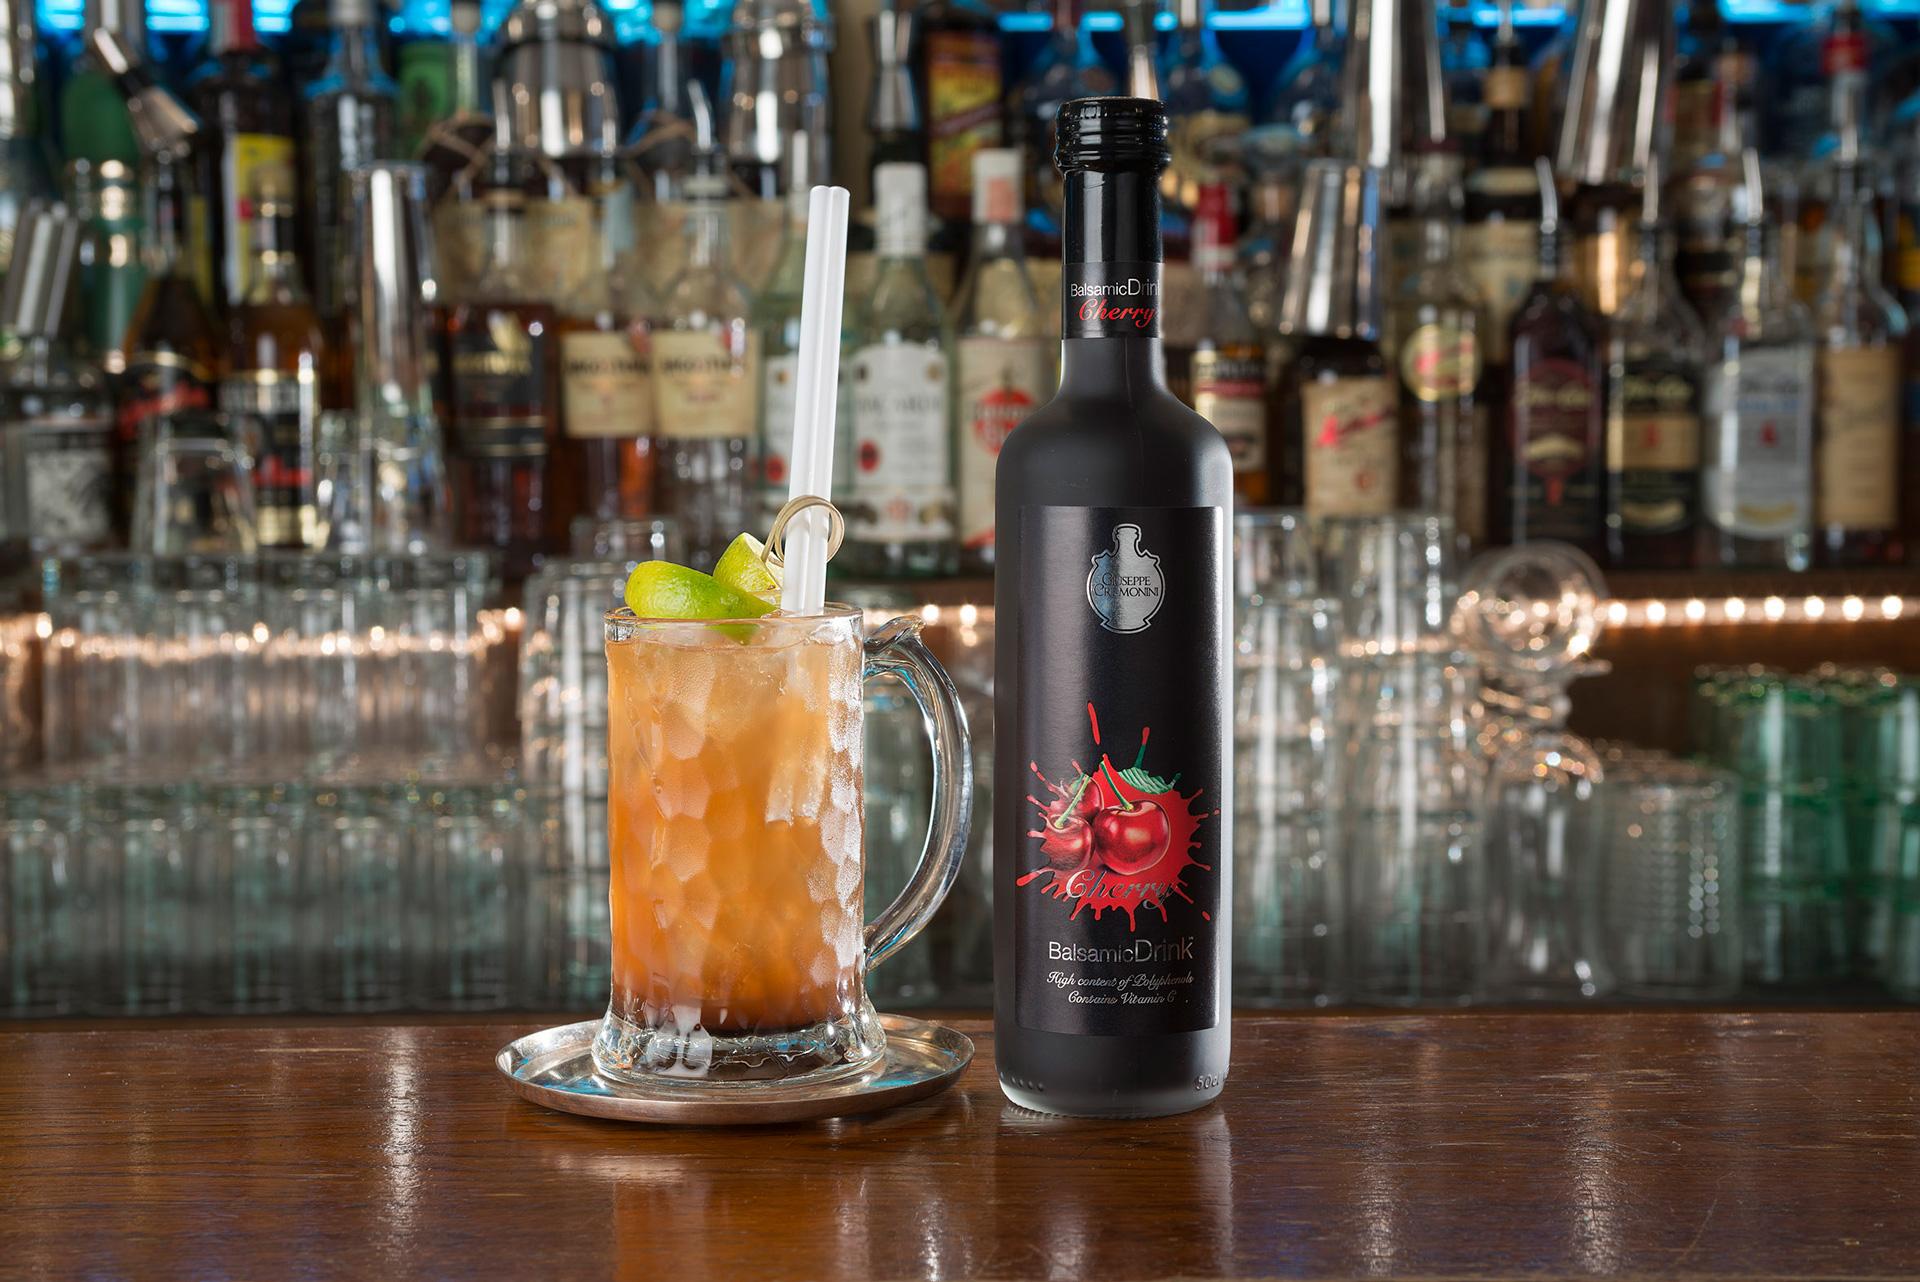 BalsamicDrink cocktail - Lemon Cherry